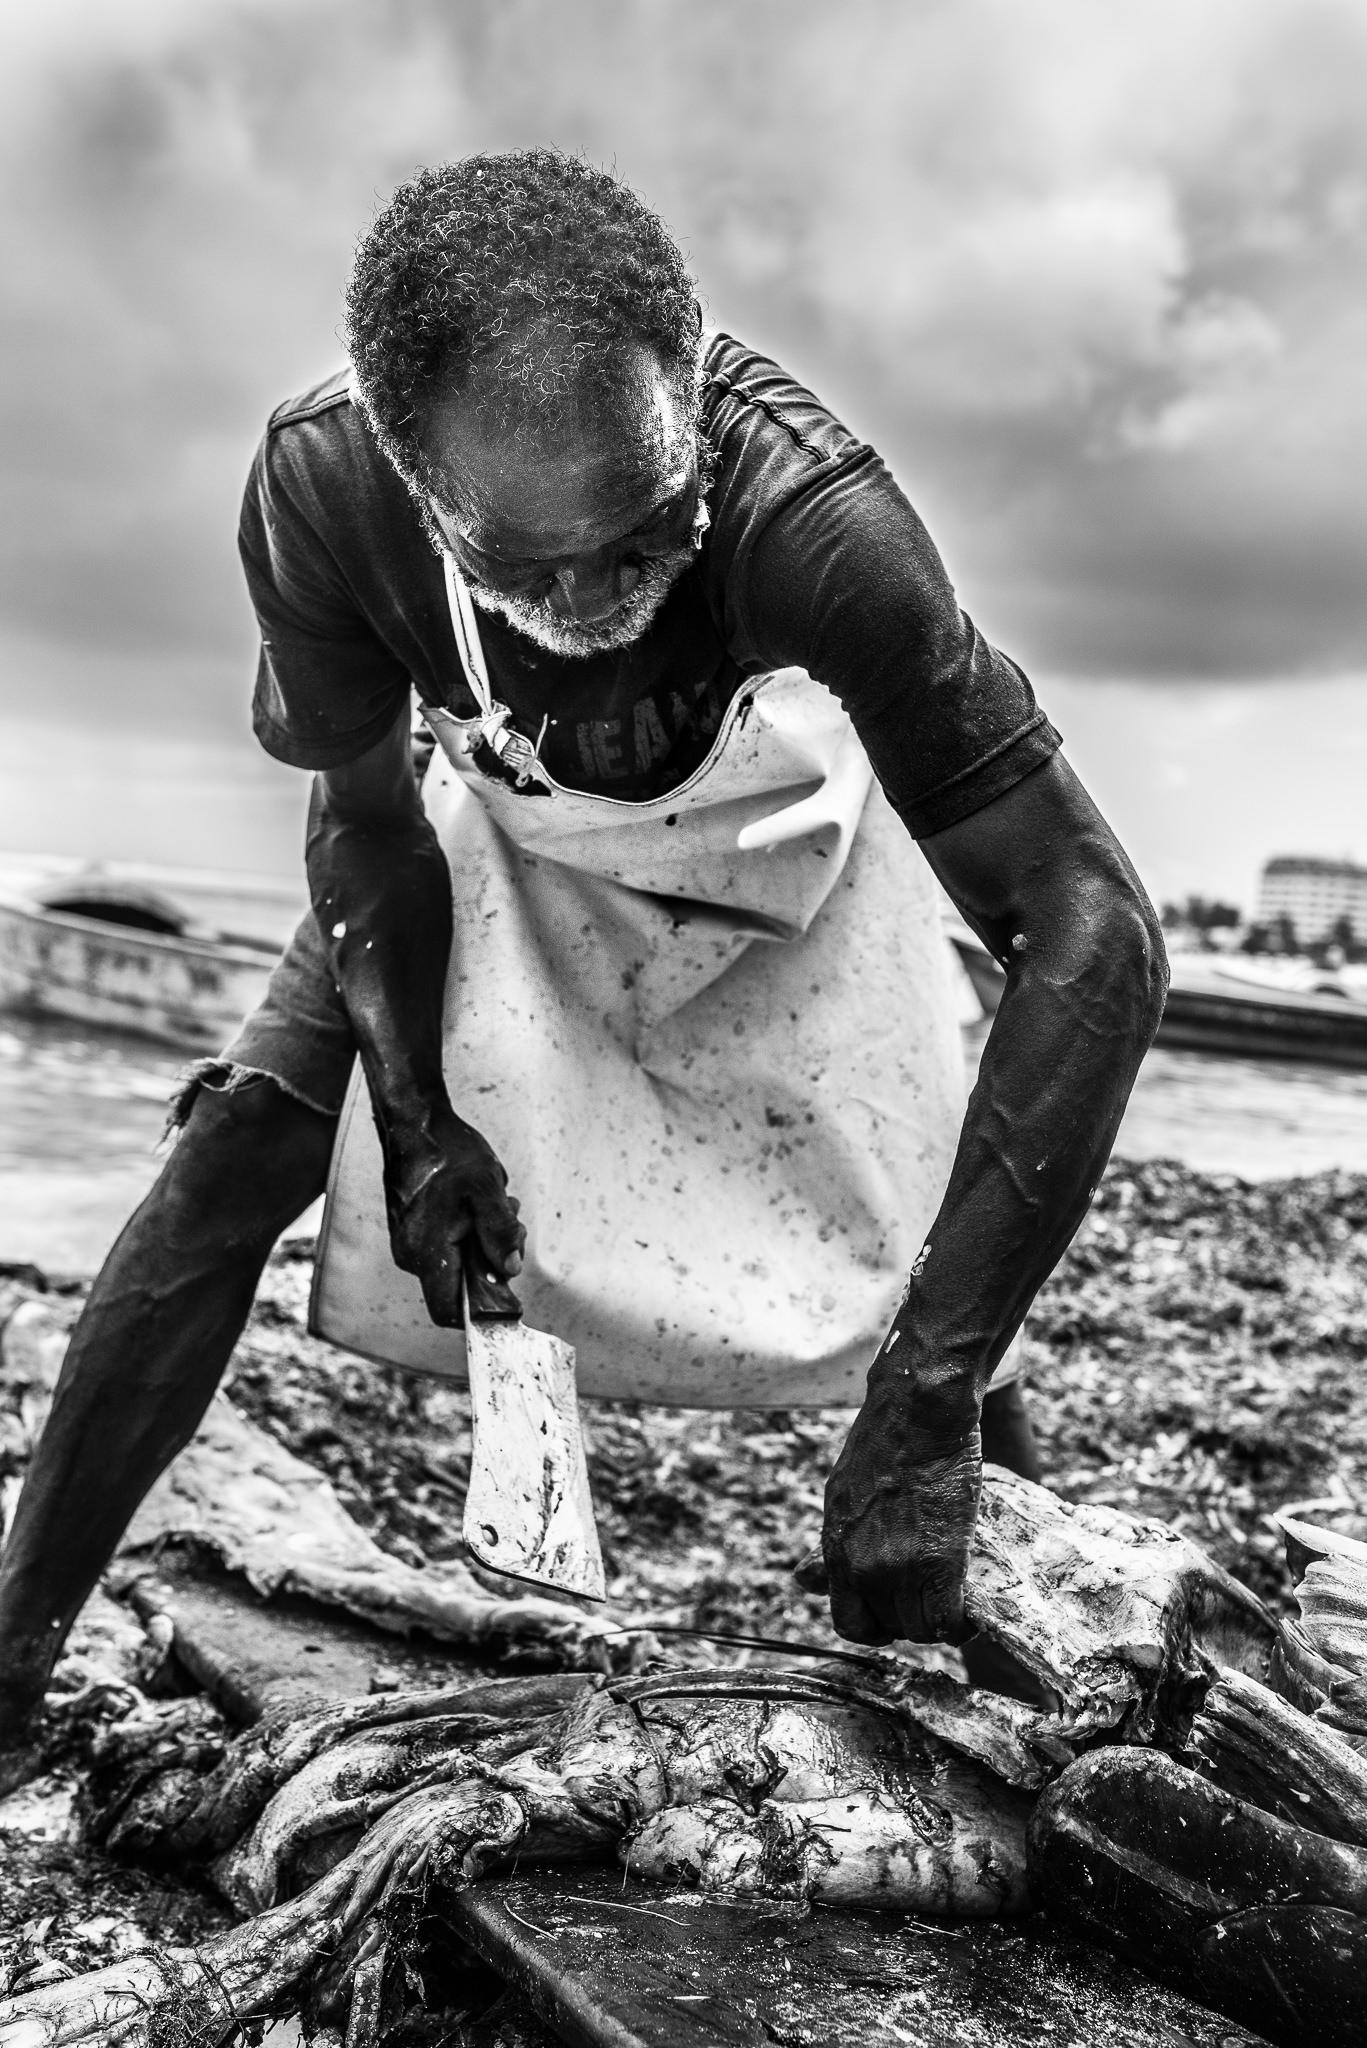 barco_sai_sanandres_colombia_caribe_fisherman_haya_sky_blue_isla_island_00011.jpg